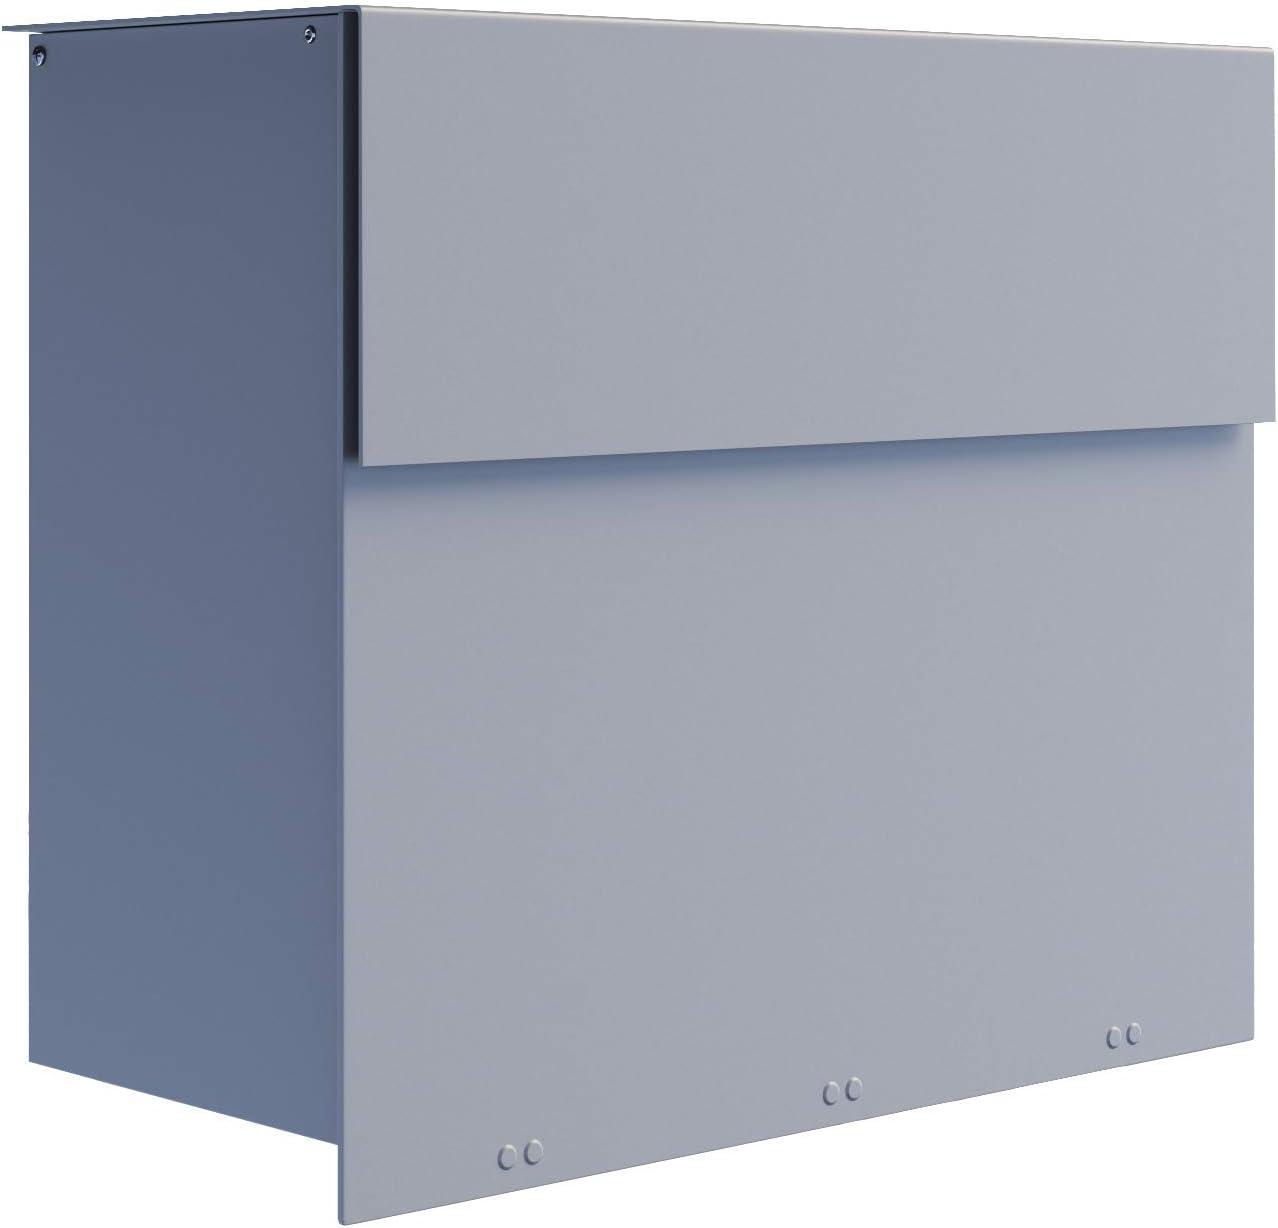 MOLTO Contemporary Designer Mailbox in Powder-Coated Grey